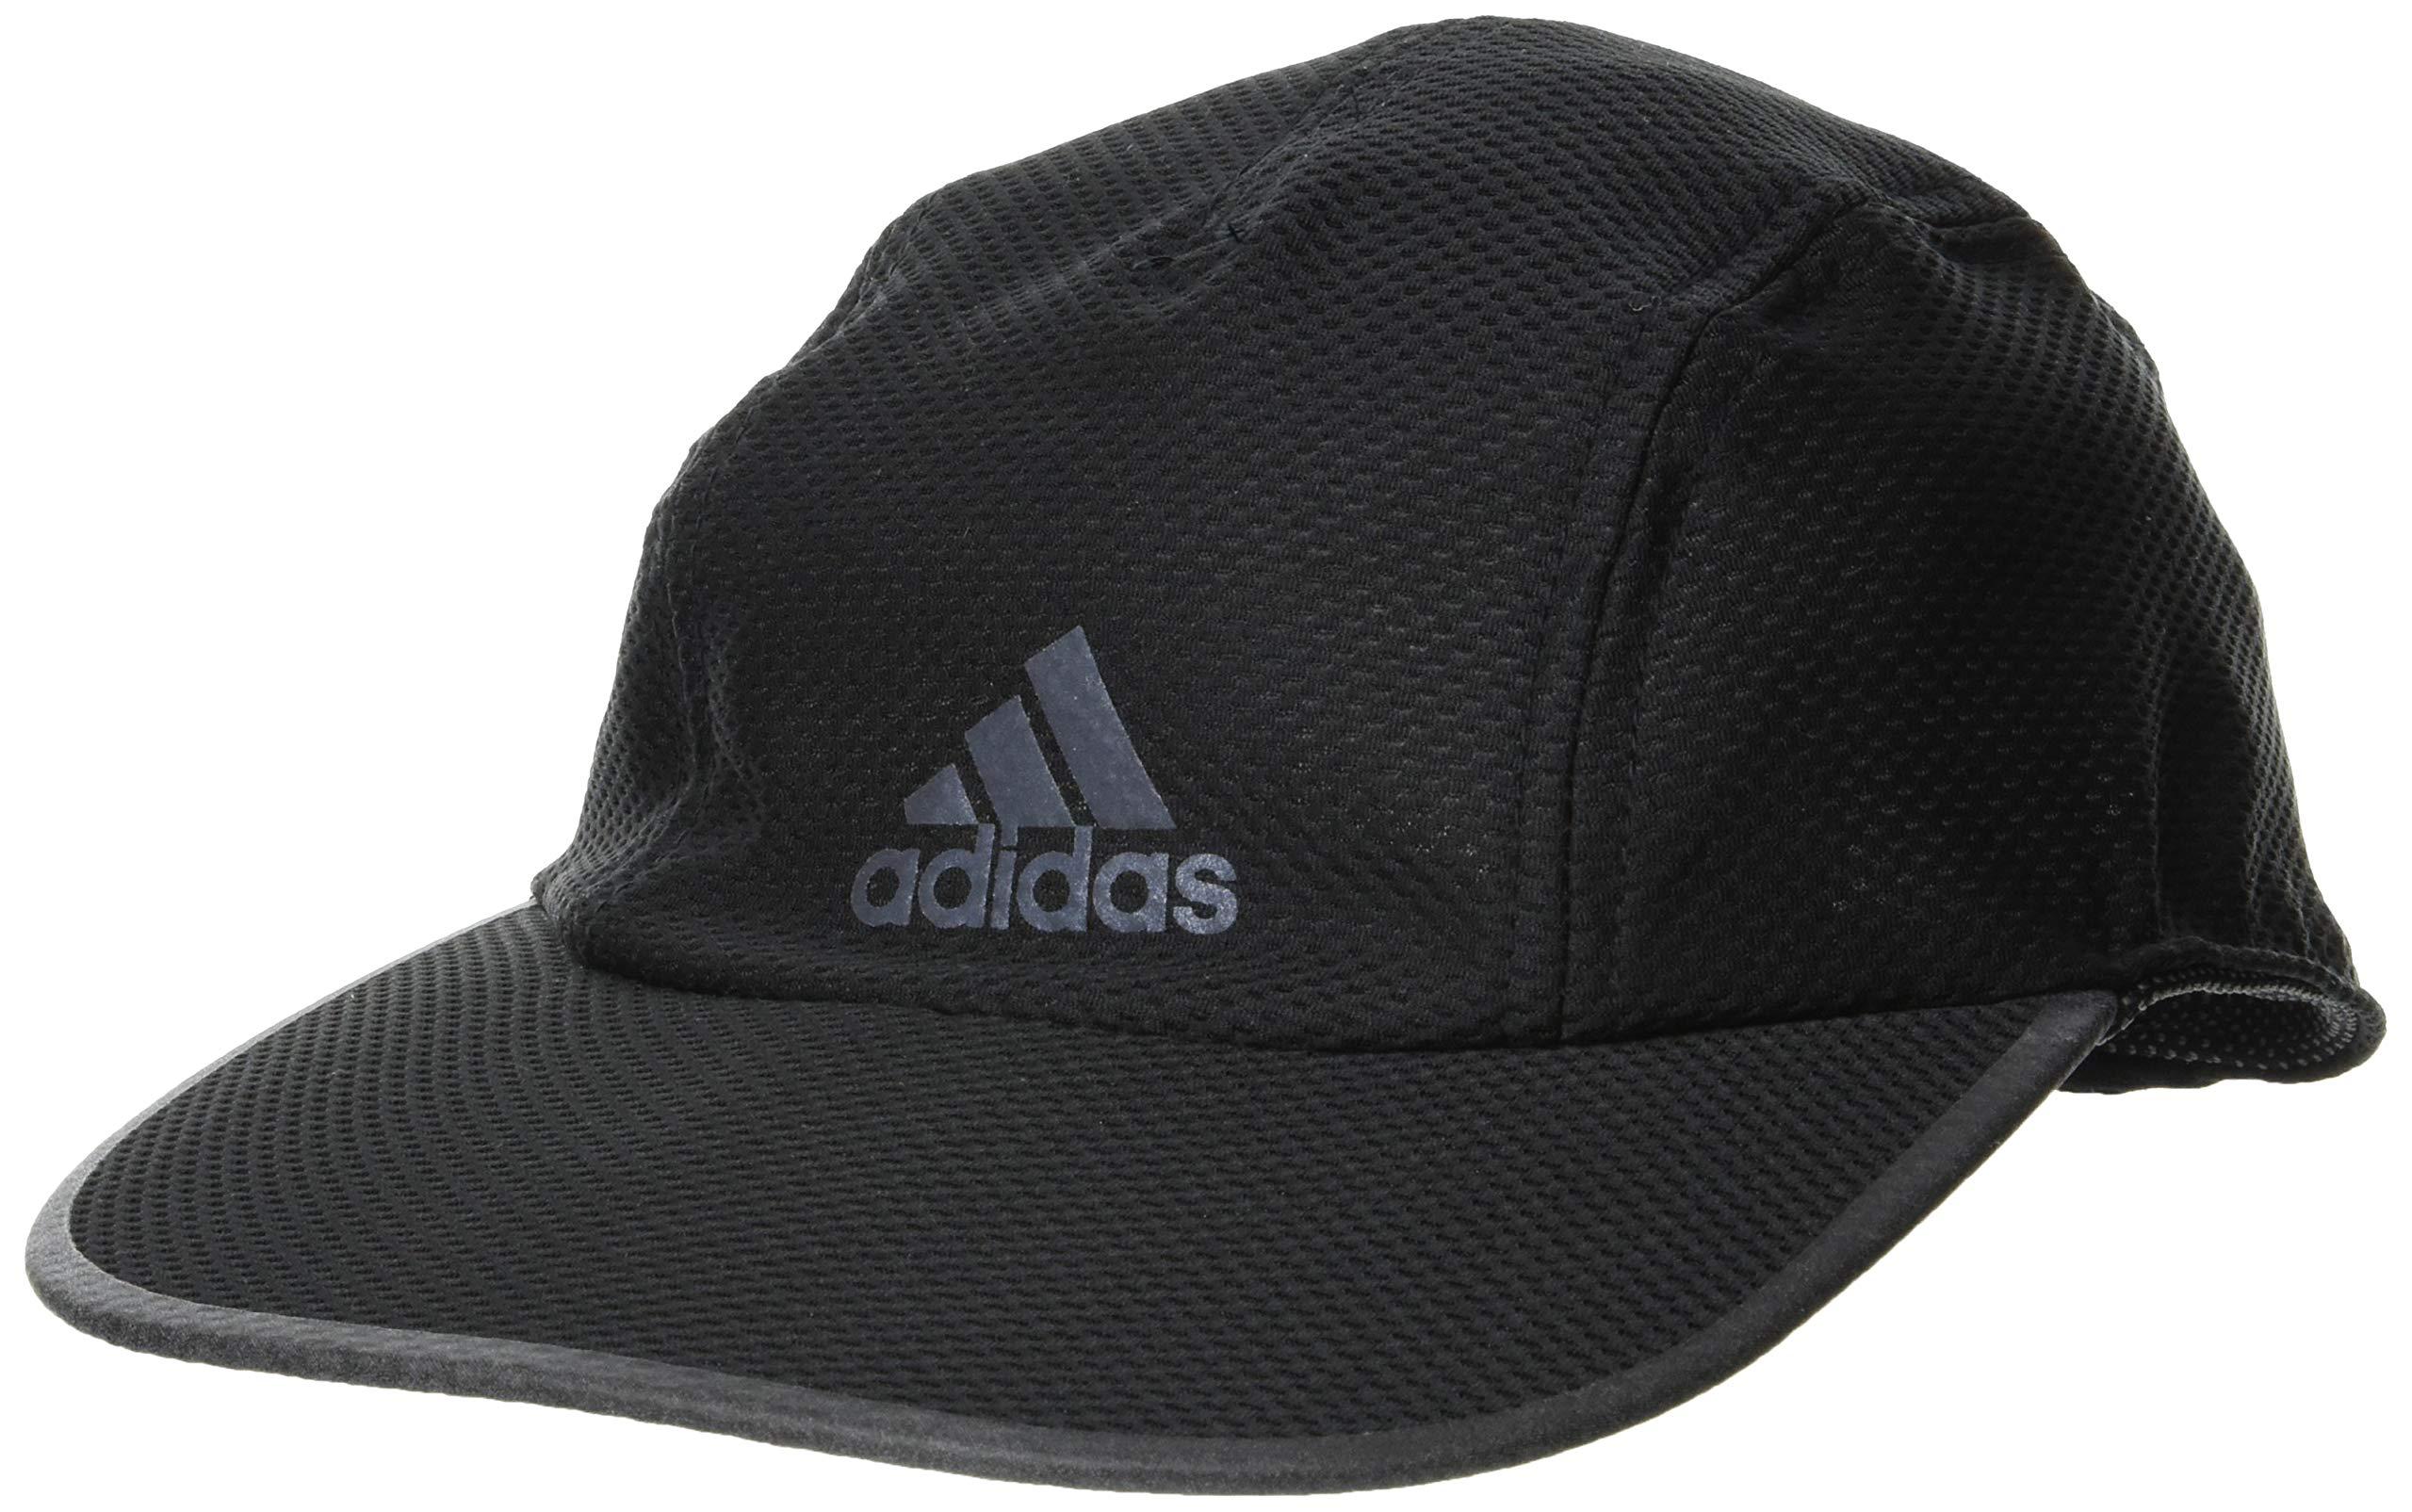 adidas Run MES CA A.R. Hat, Black/Black/Black Reflective, OSFM